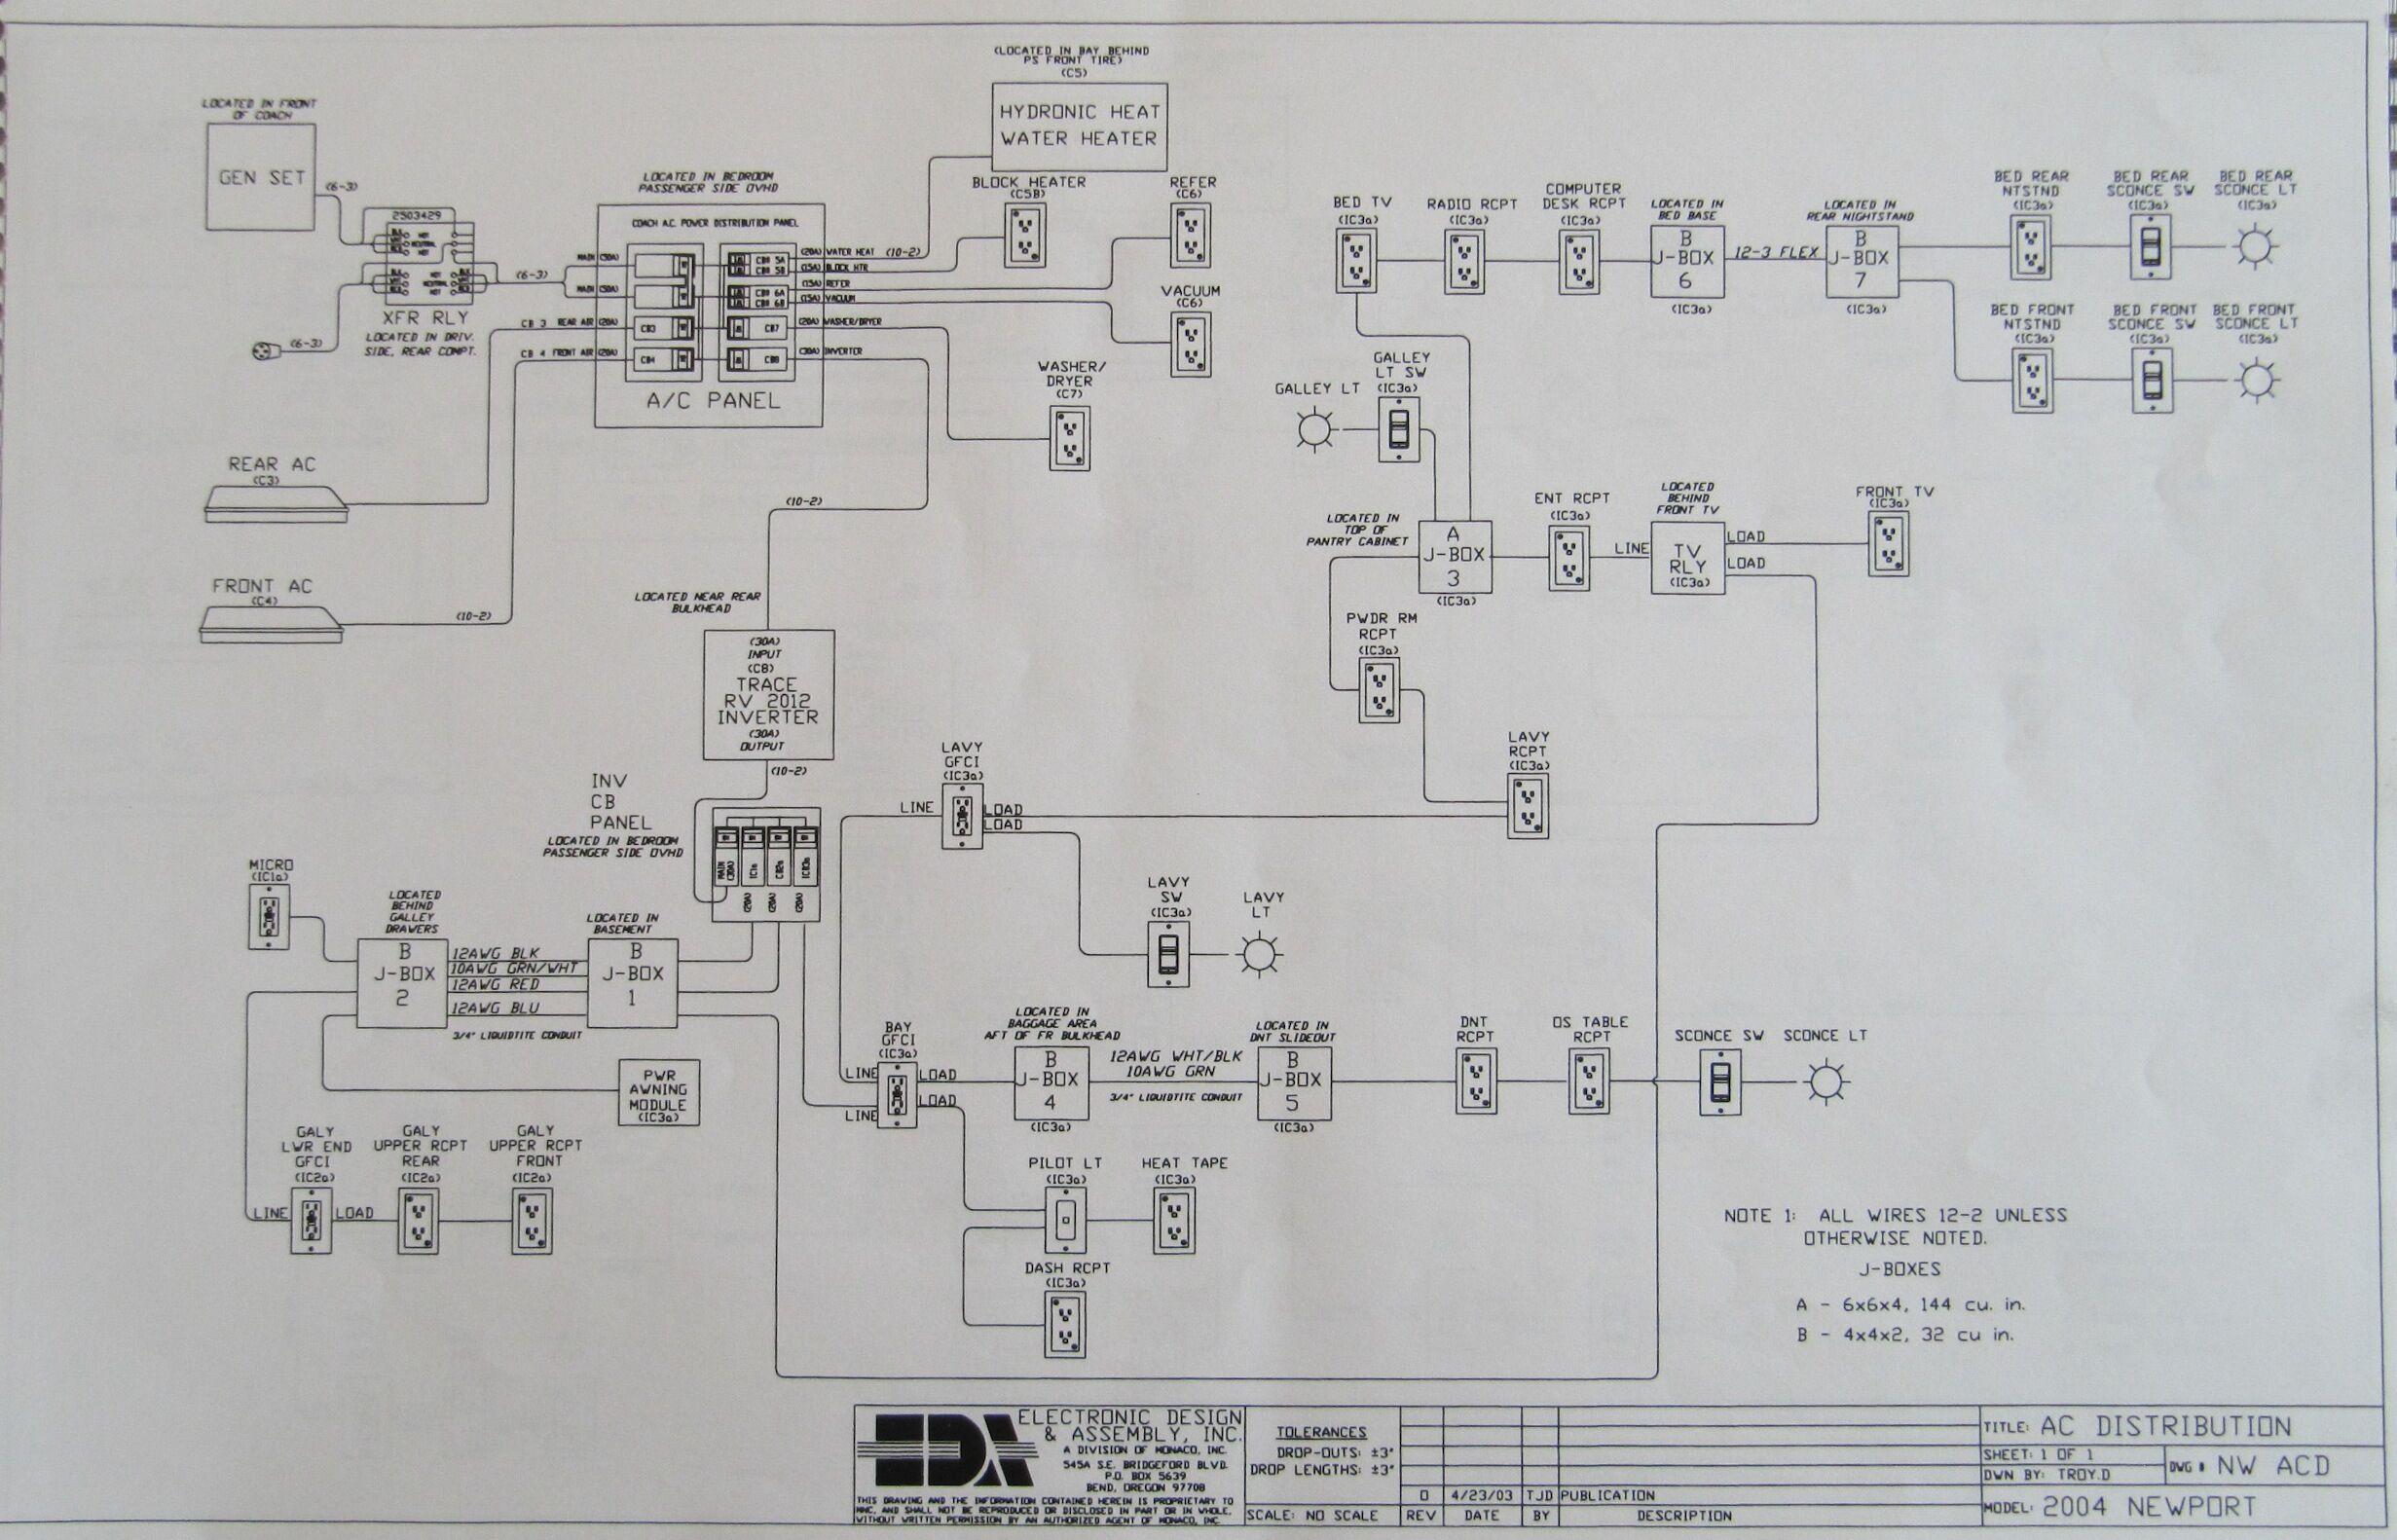 Spartan Motorhome Chis Wiring Diagram - Dashboard Light Wiring Diagram For  2004 mustangs.kawasakijuh.pubblicanews.it | Spartan Motorhome Chis Wiring Diagram |  | Bege Wiring Diagram Full Edition